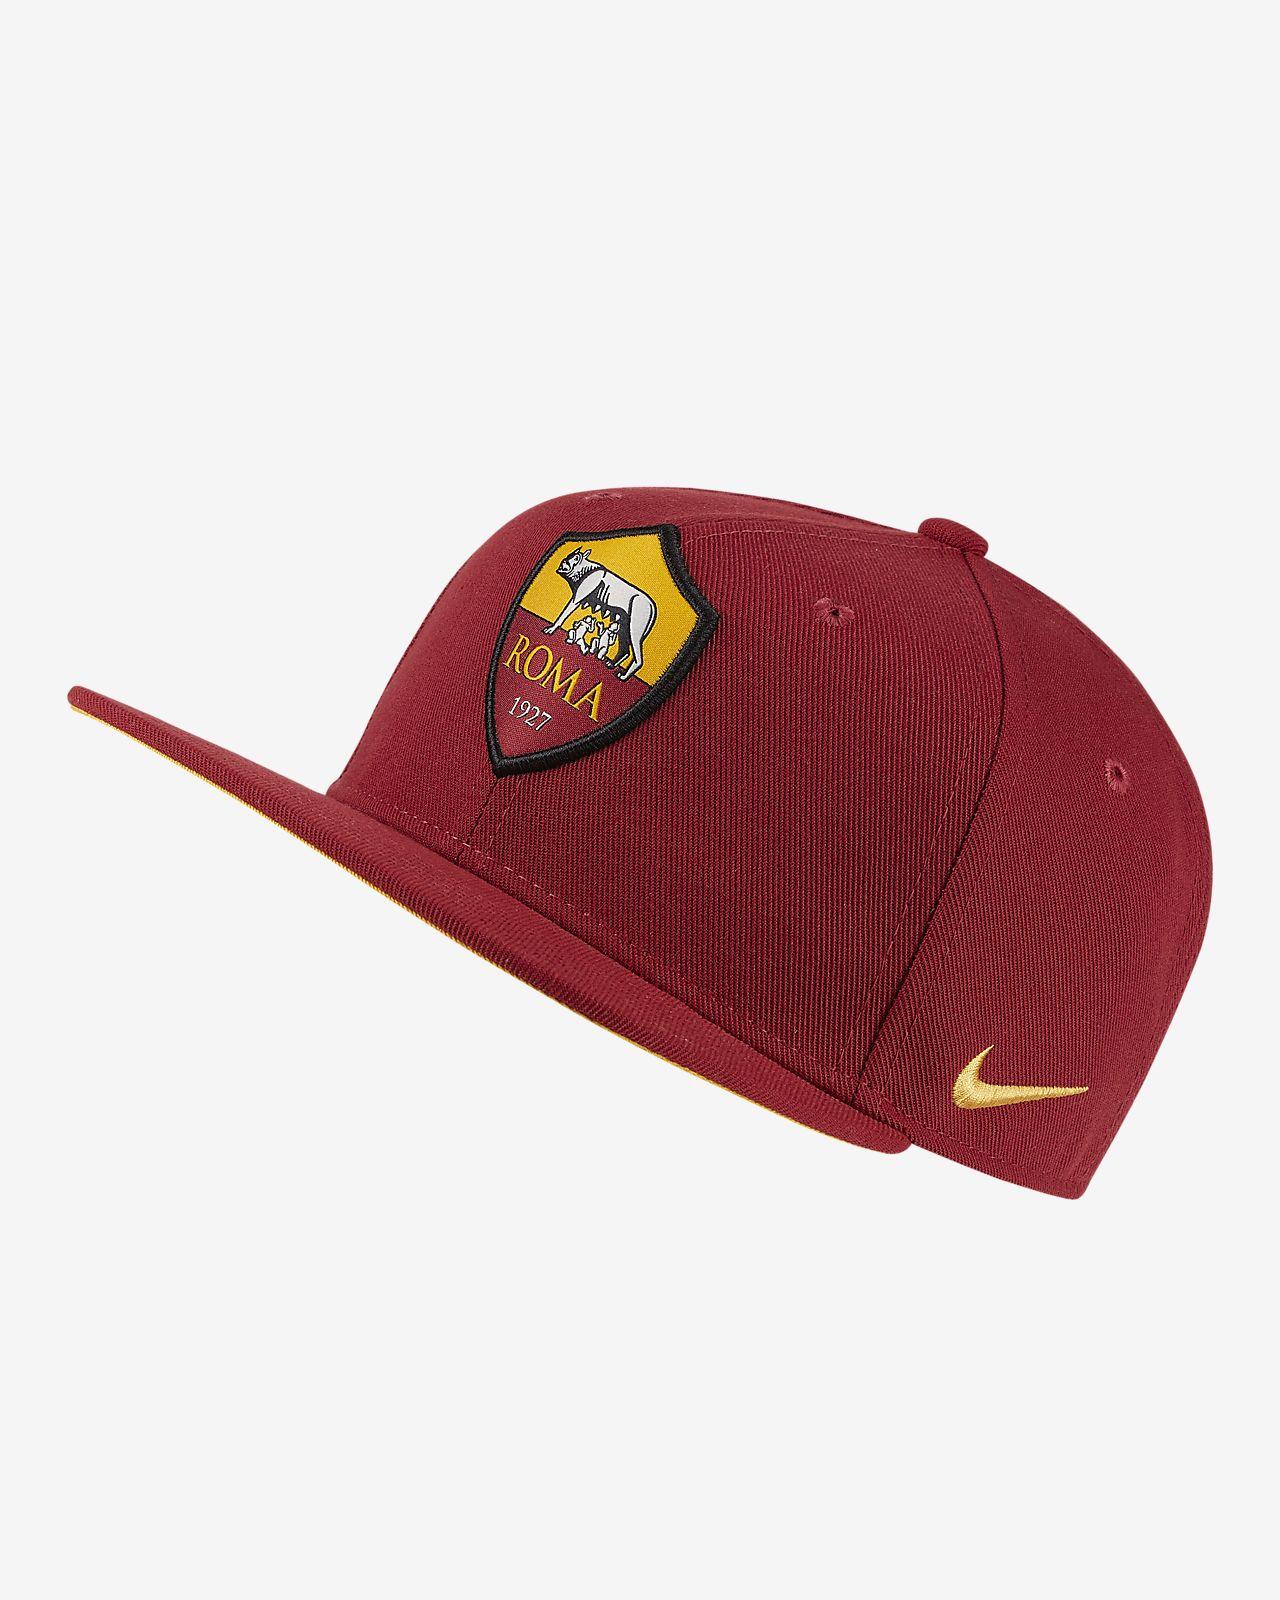 Nike Pro A.S. Roma Gorra regulable - Niño/a